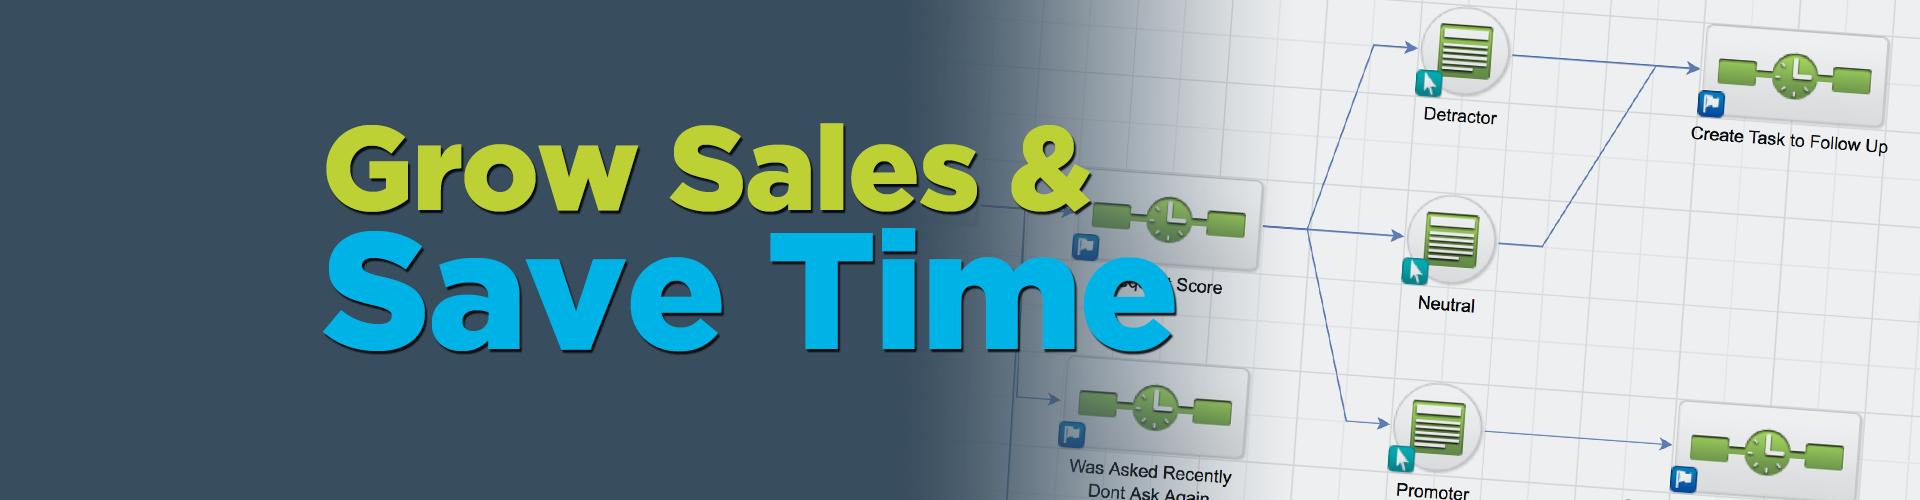 Grow Sales & Save Time